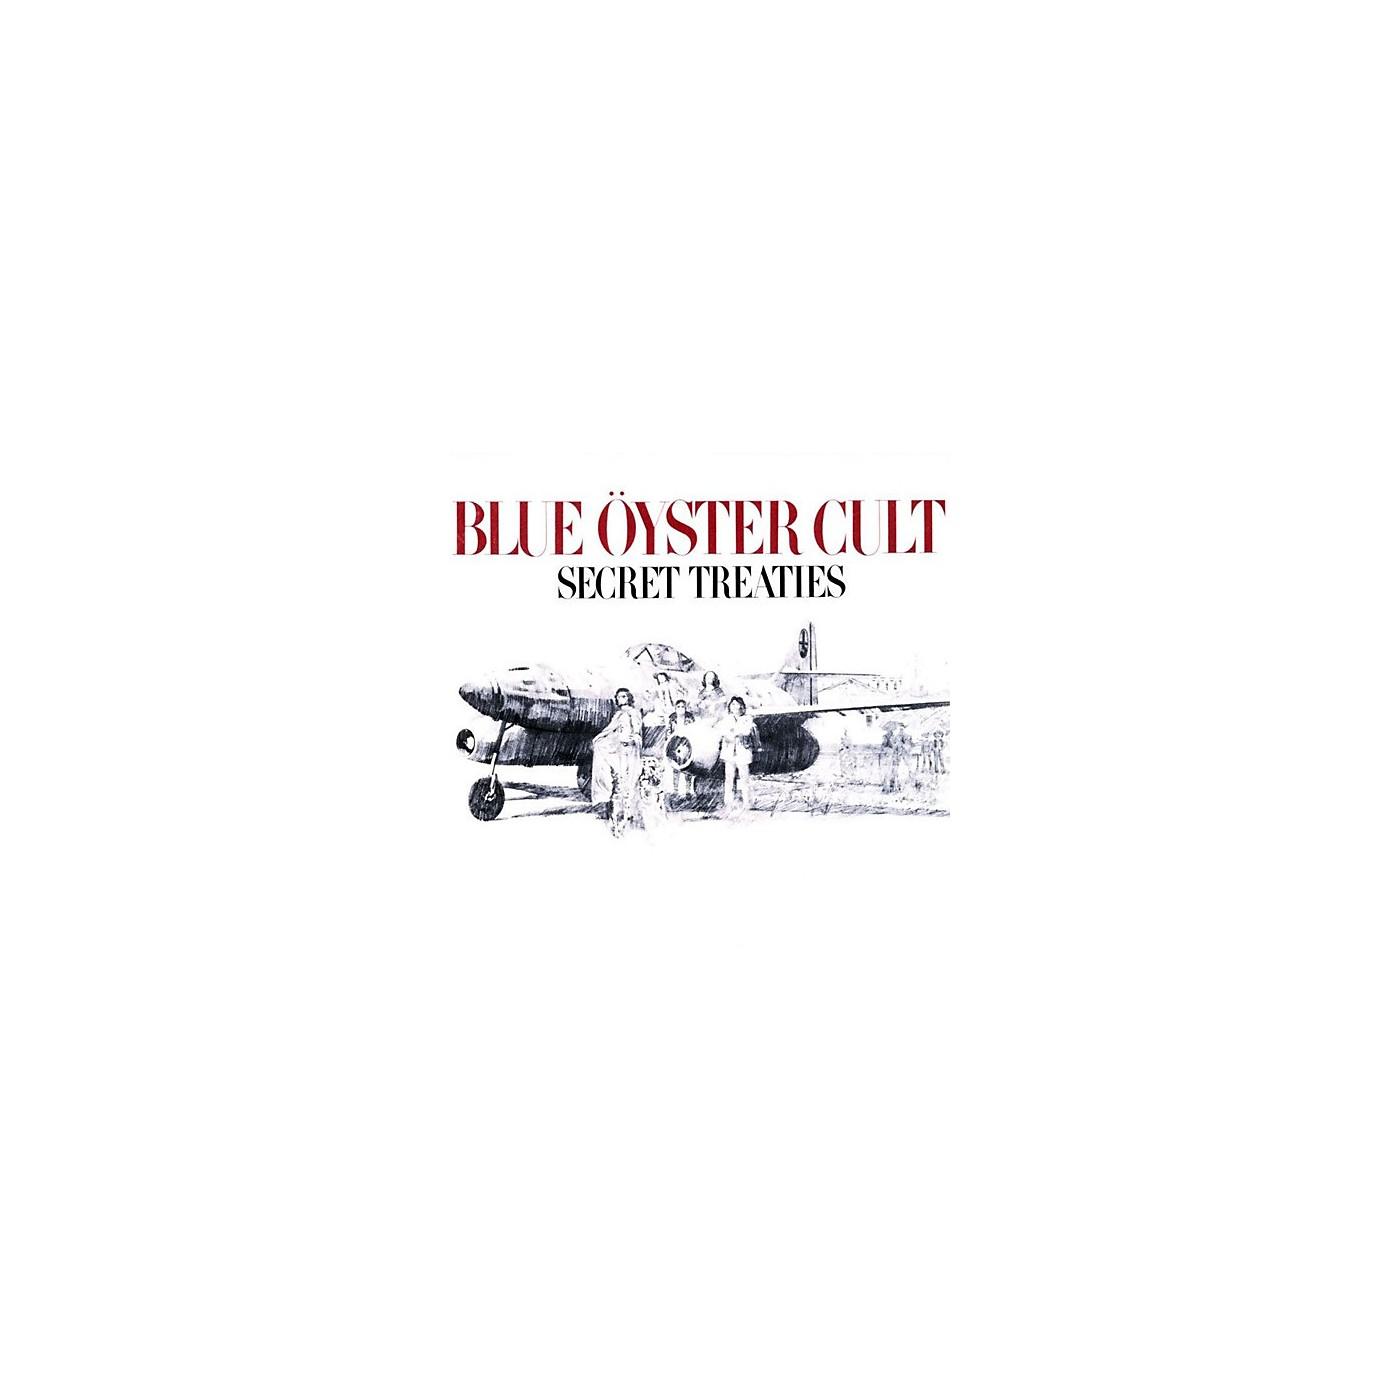 Alliance Blue Oyster Cult - Blue Oyster Cult : Secret Treaties thumbnail